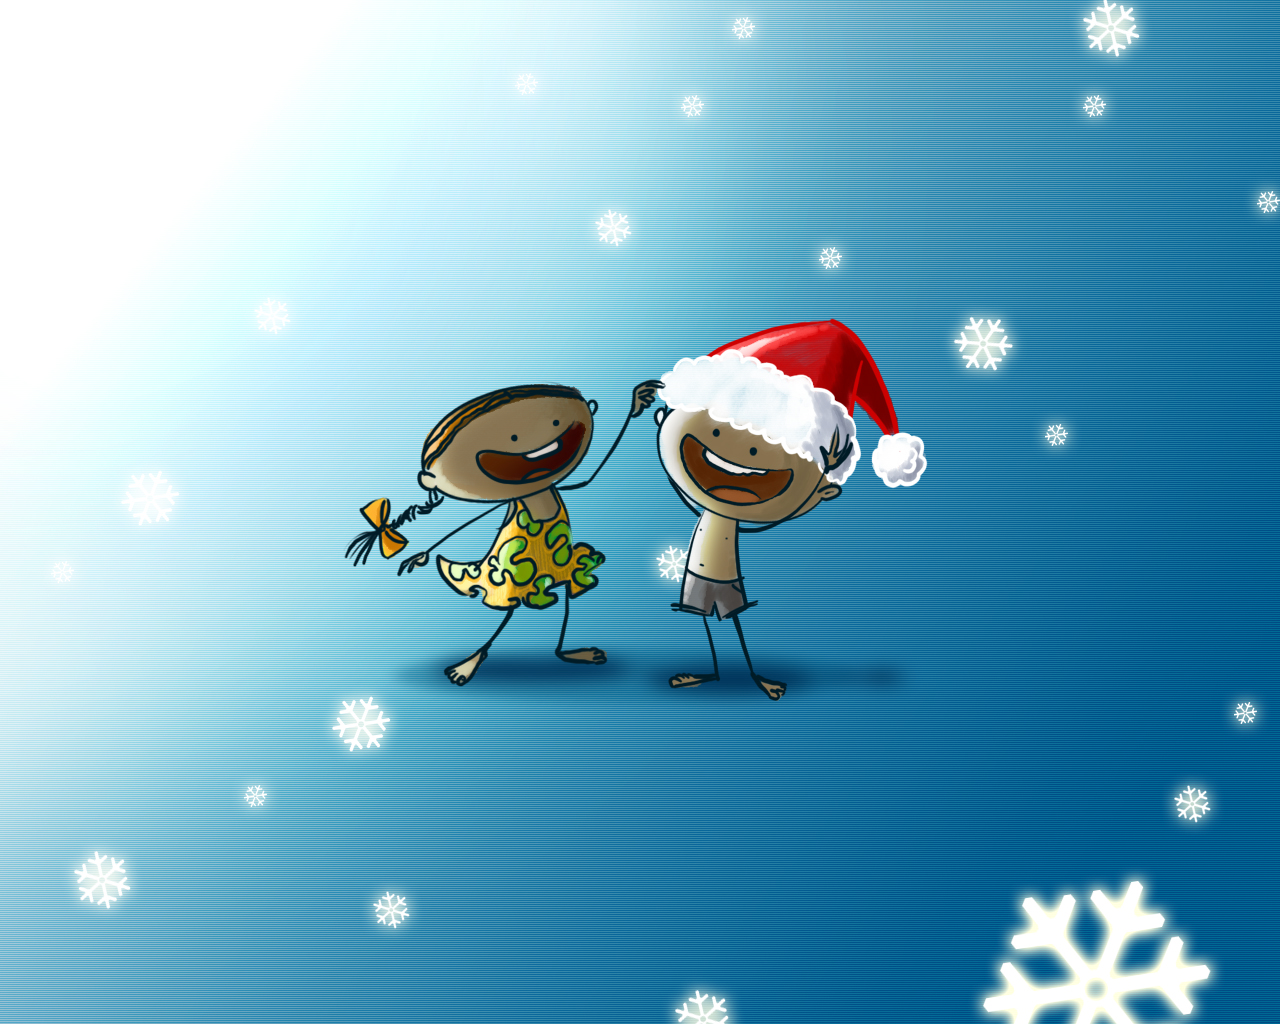 В начало > Картинки: Новый Год (New Year)